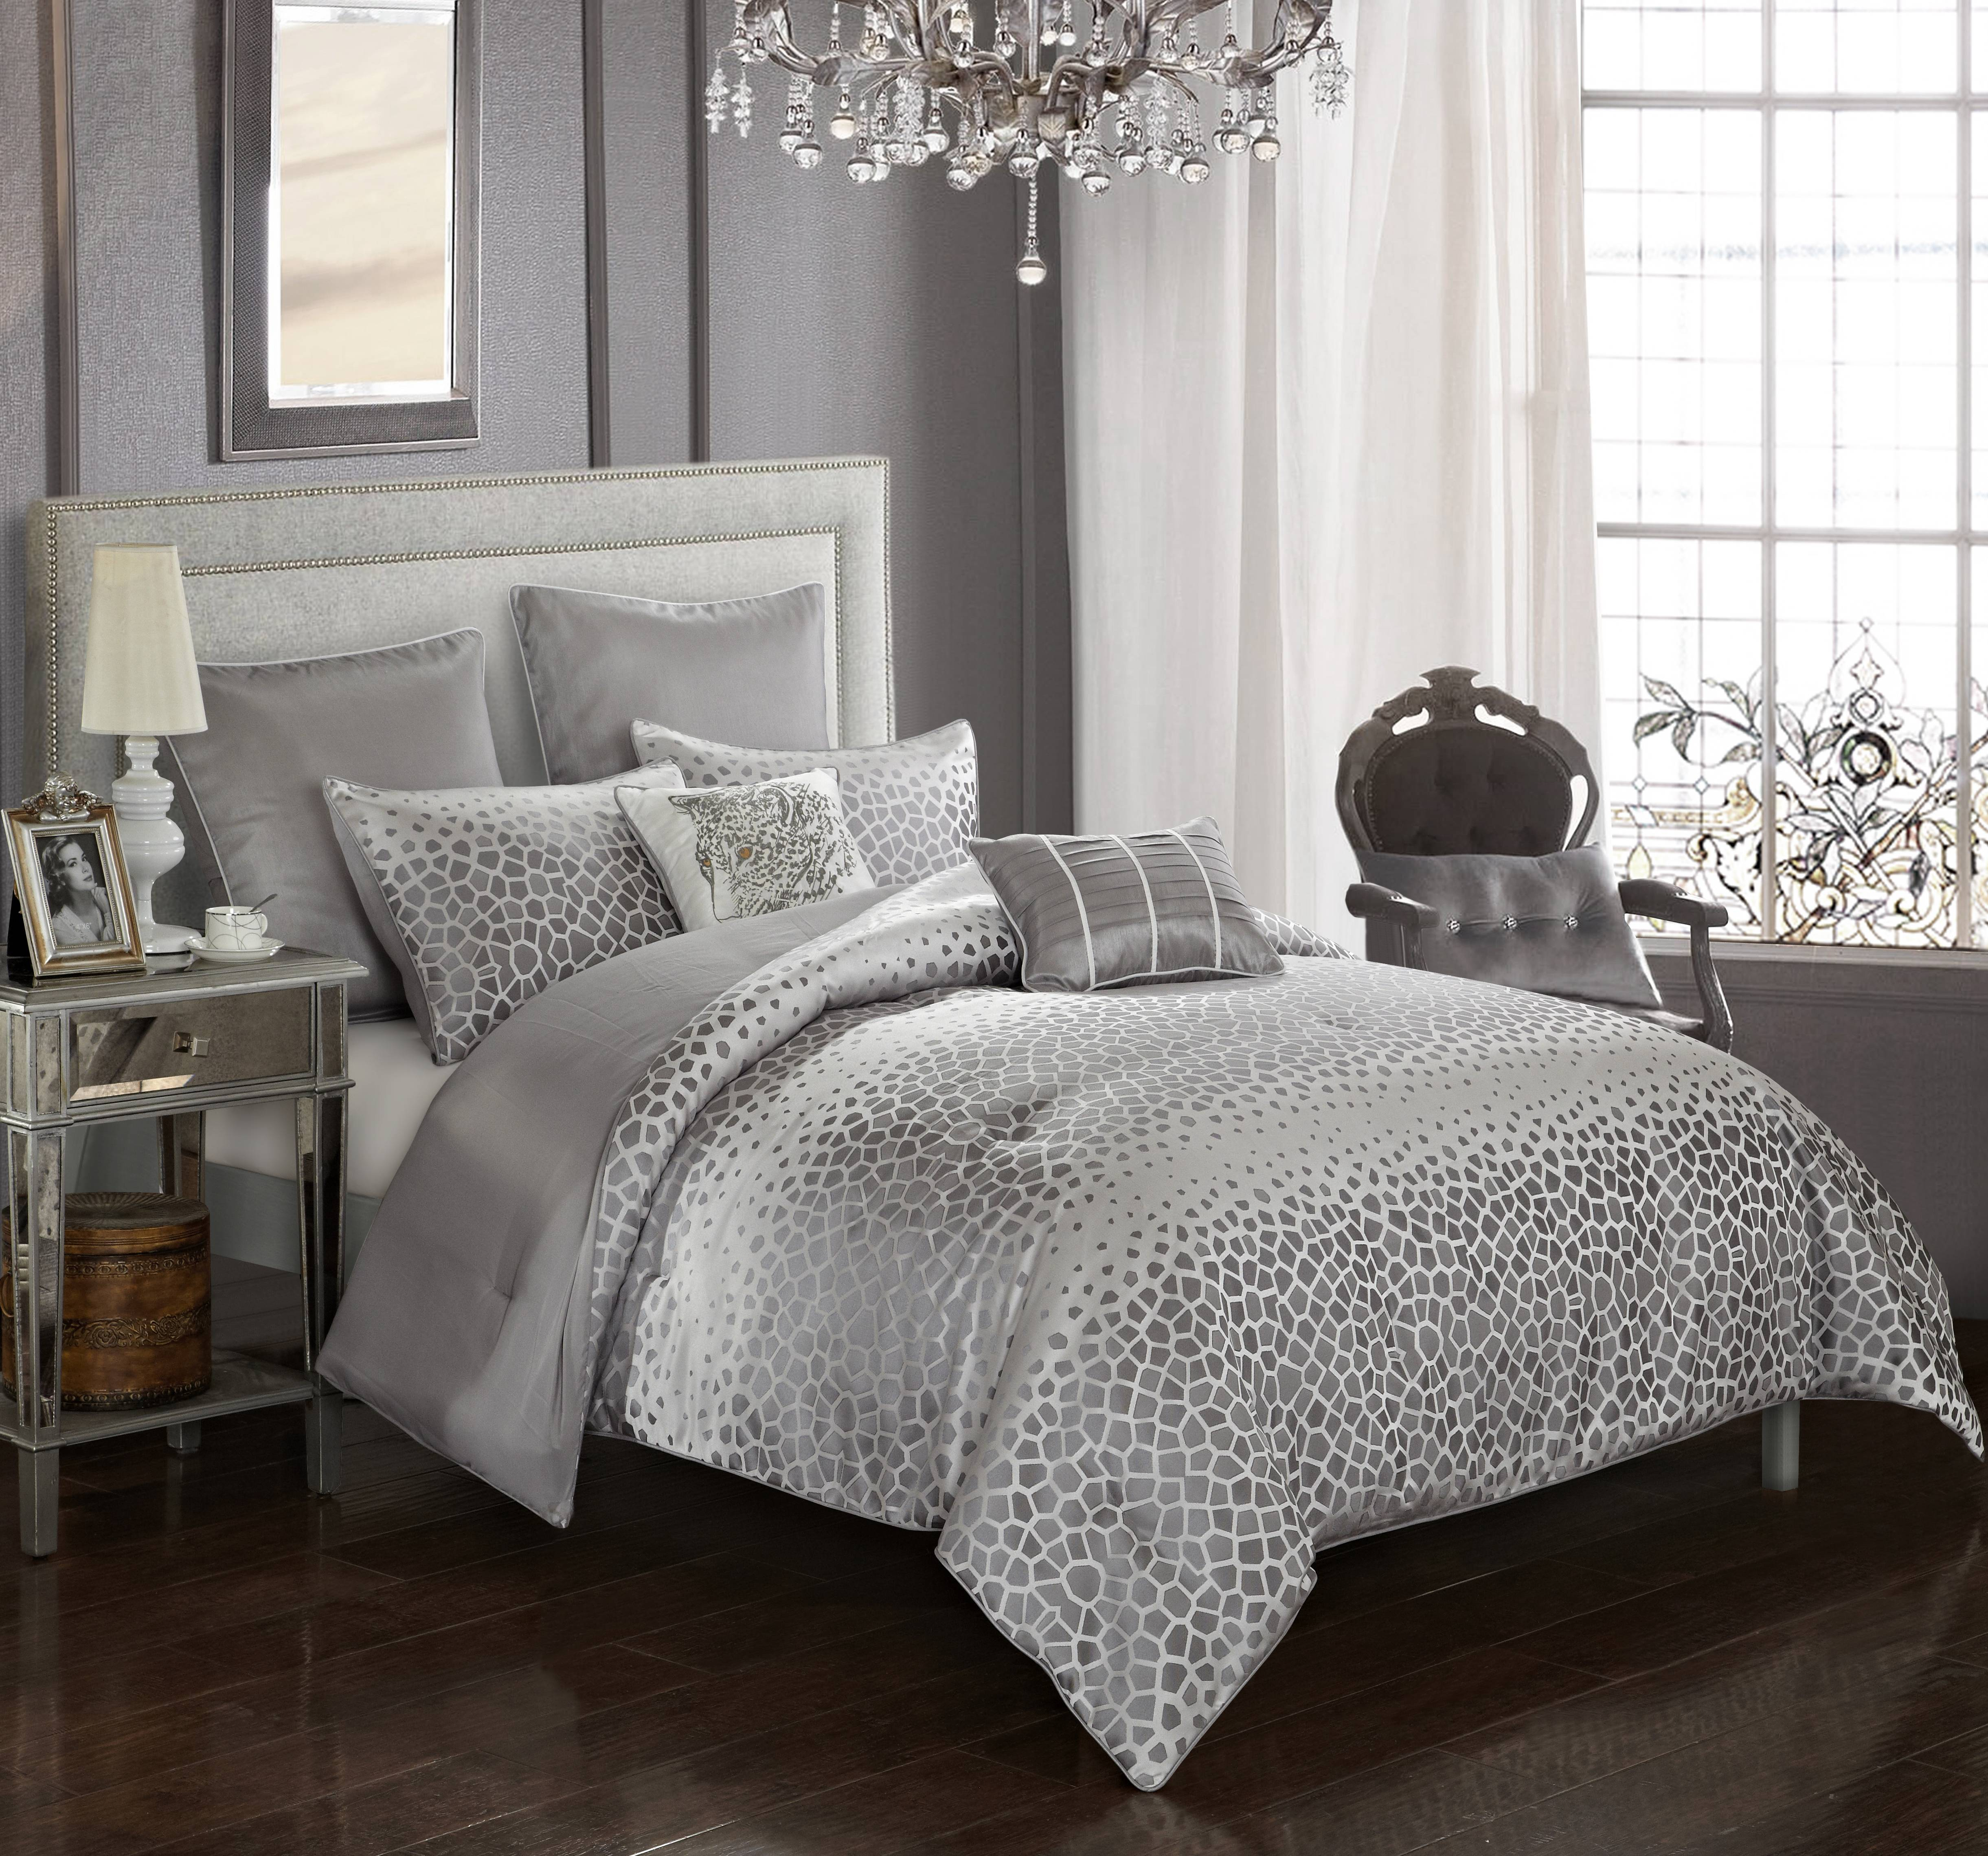 Better Homes & Gardens Striped Dot Jacquard 7 Piece Comforter Set